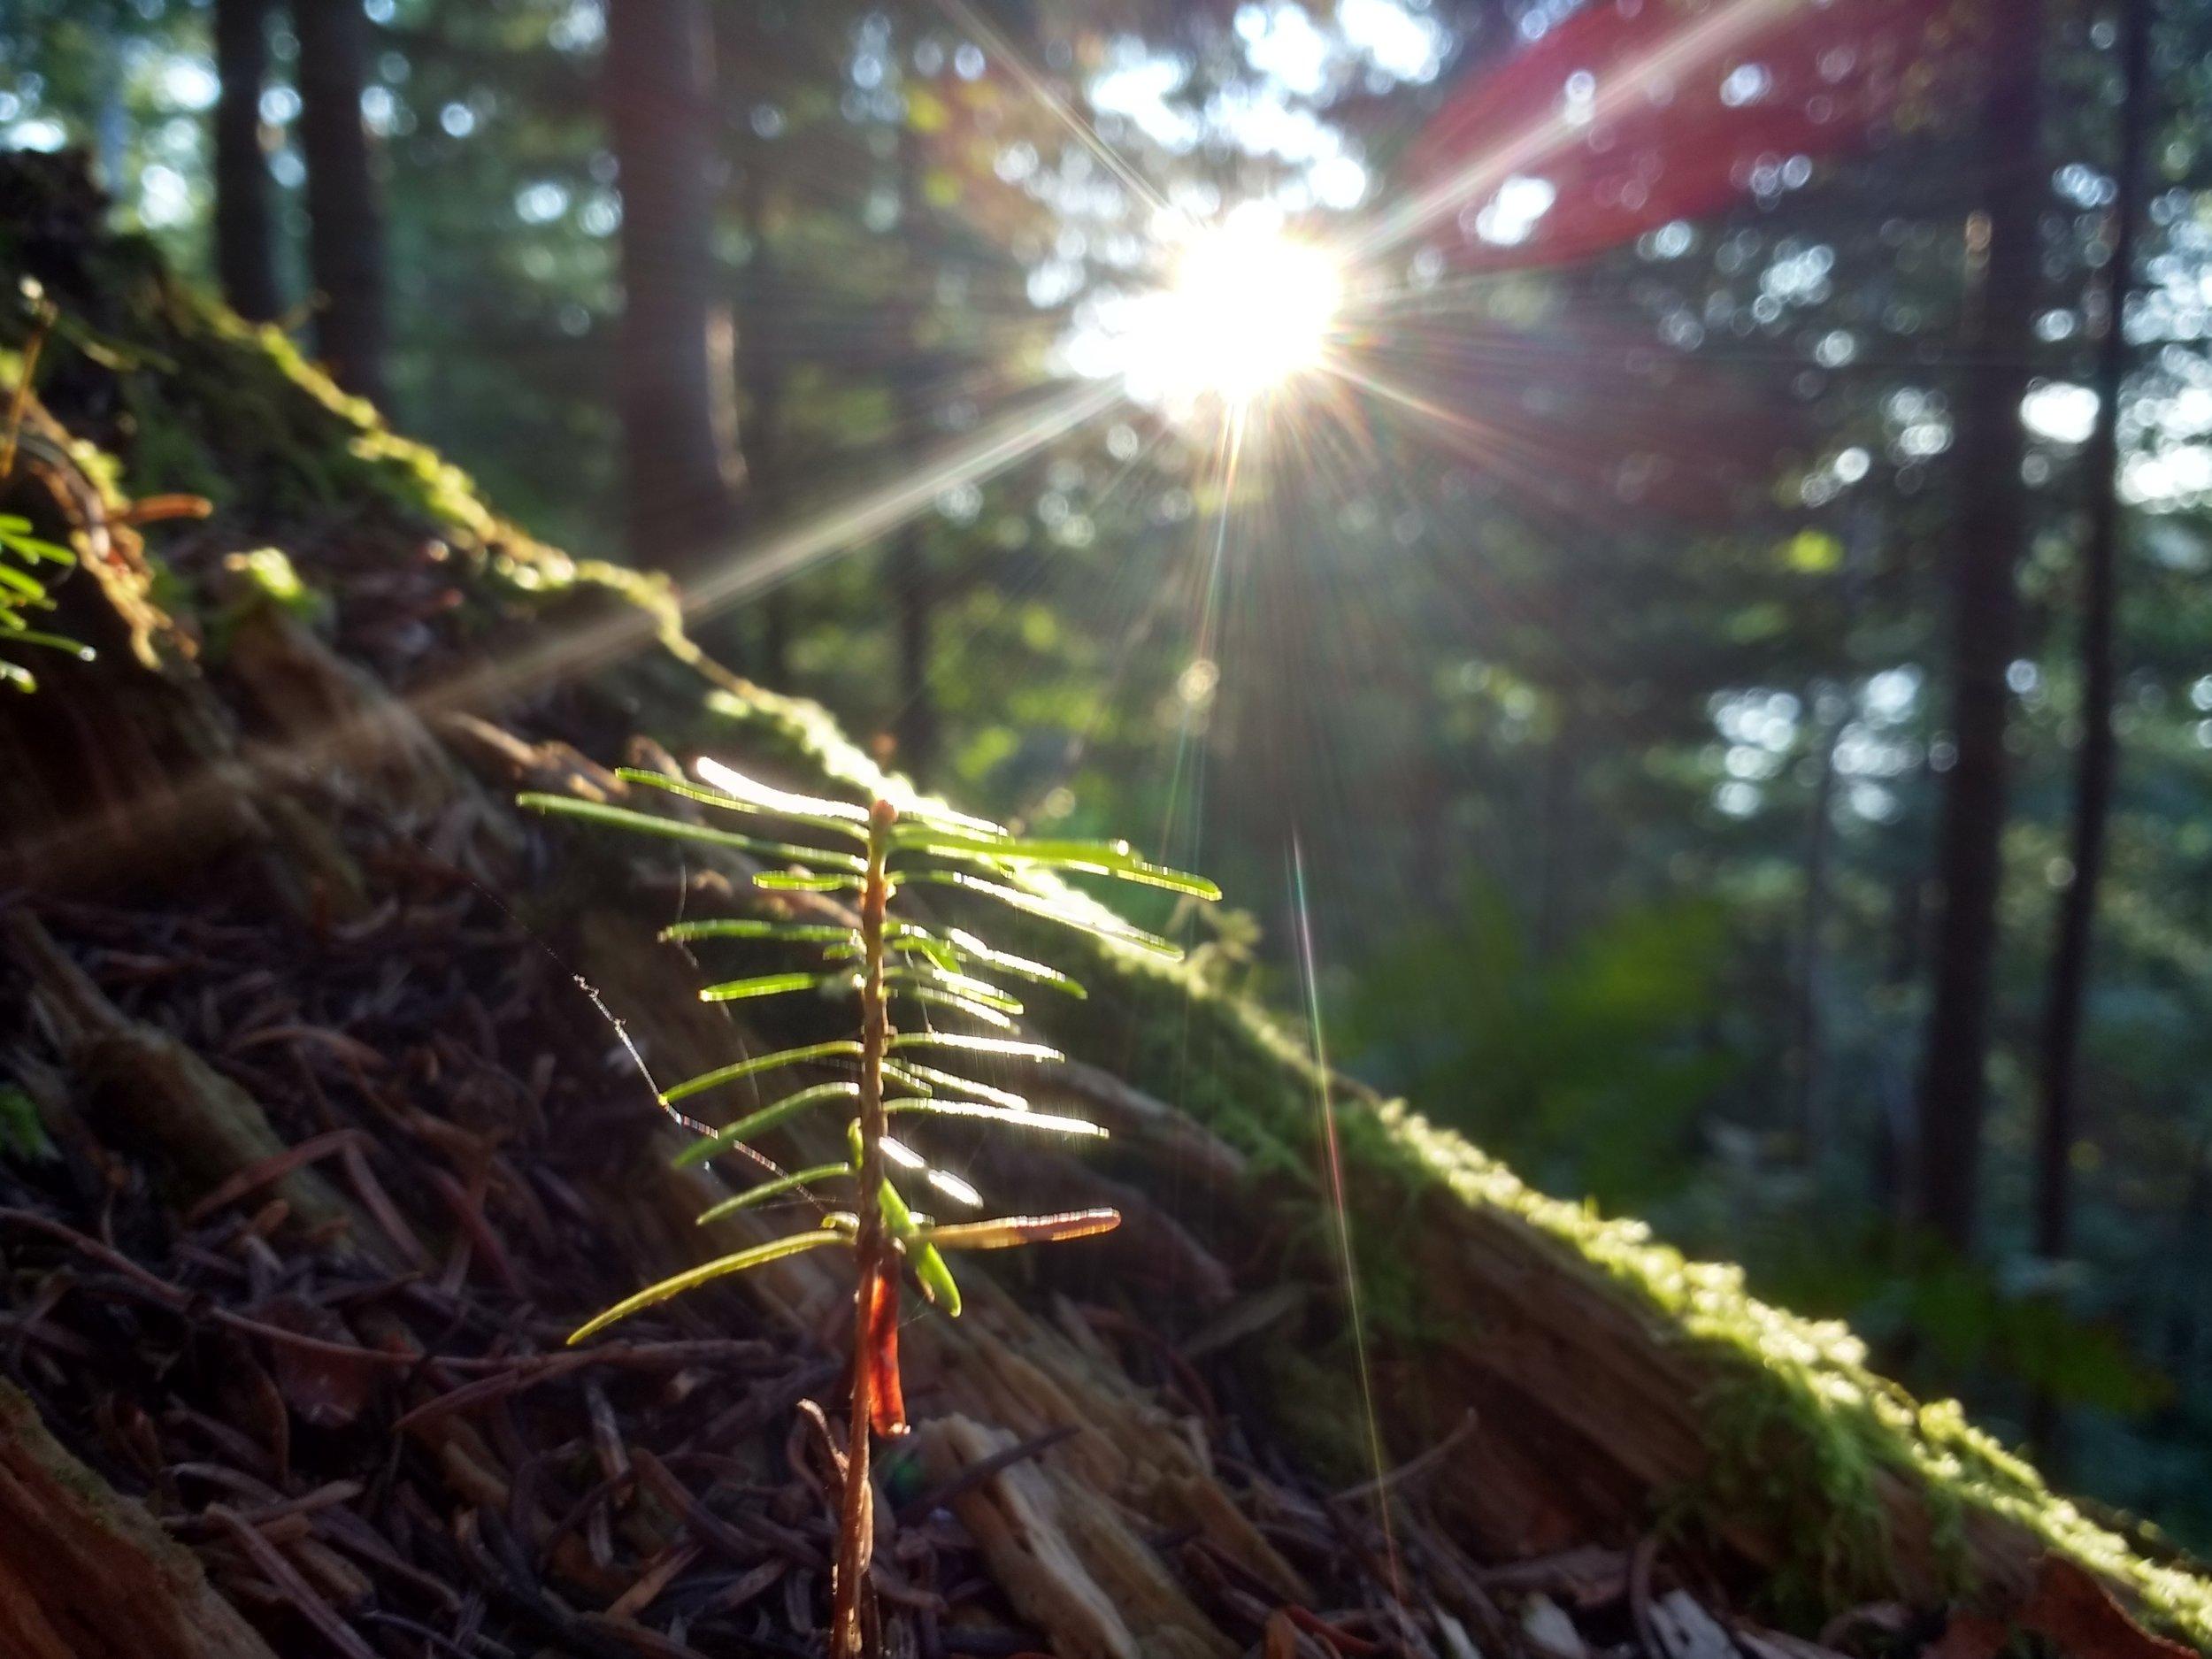 Loon Lake lil pine IMG_20180807_193015375_HDR.jpg